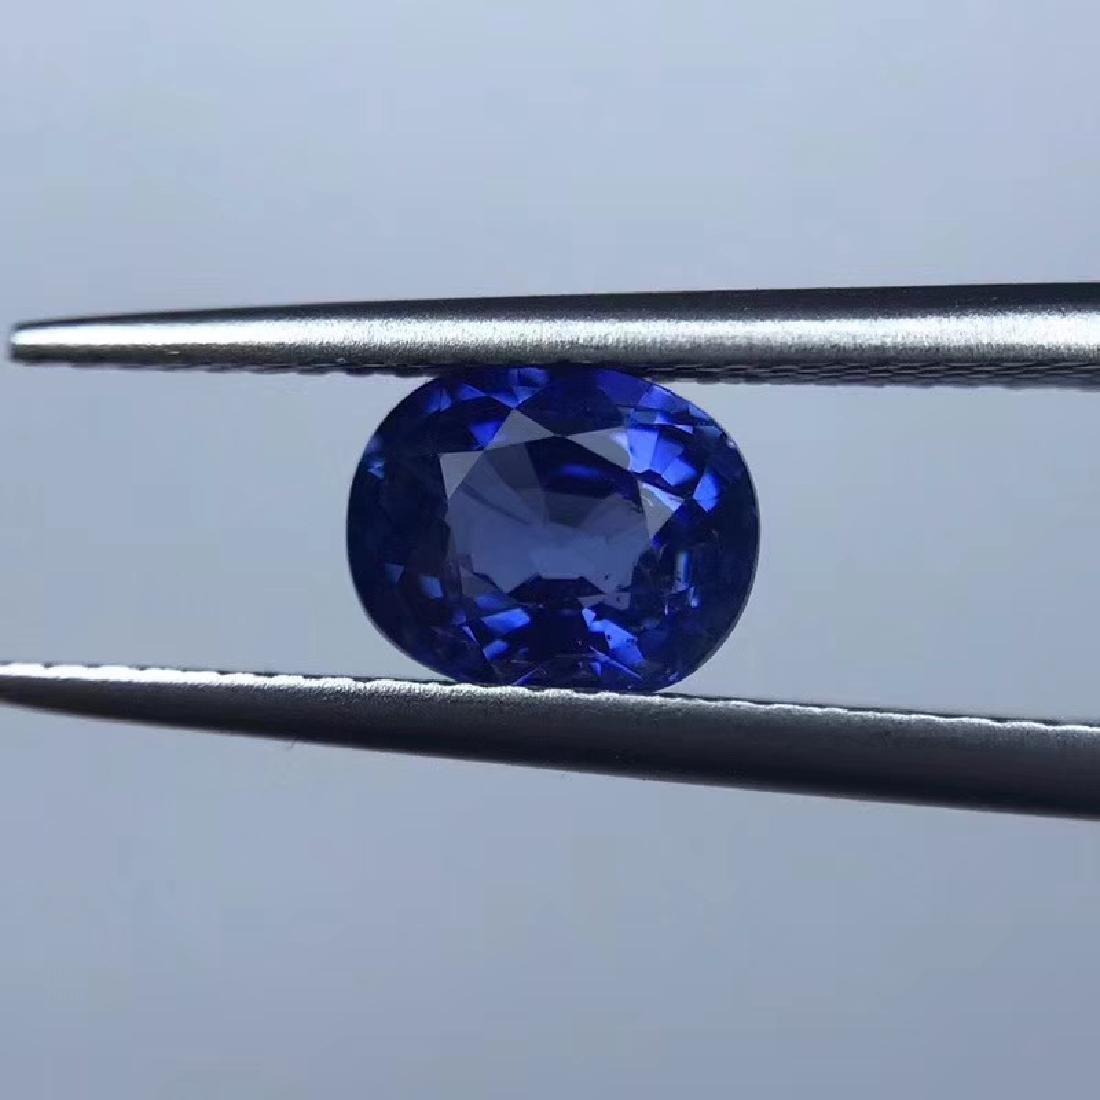 1.61 ct Sapphire 5.9*4.1*7.3 mm Oval Cut